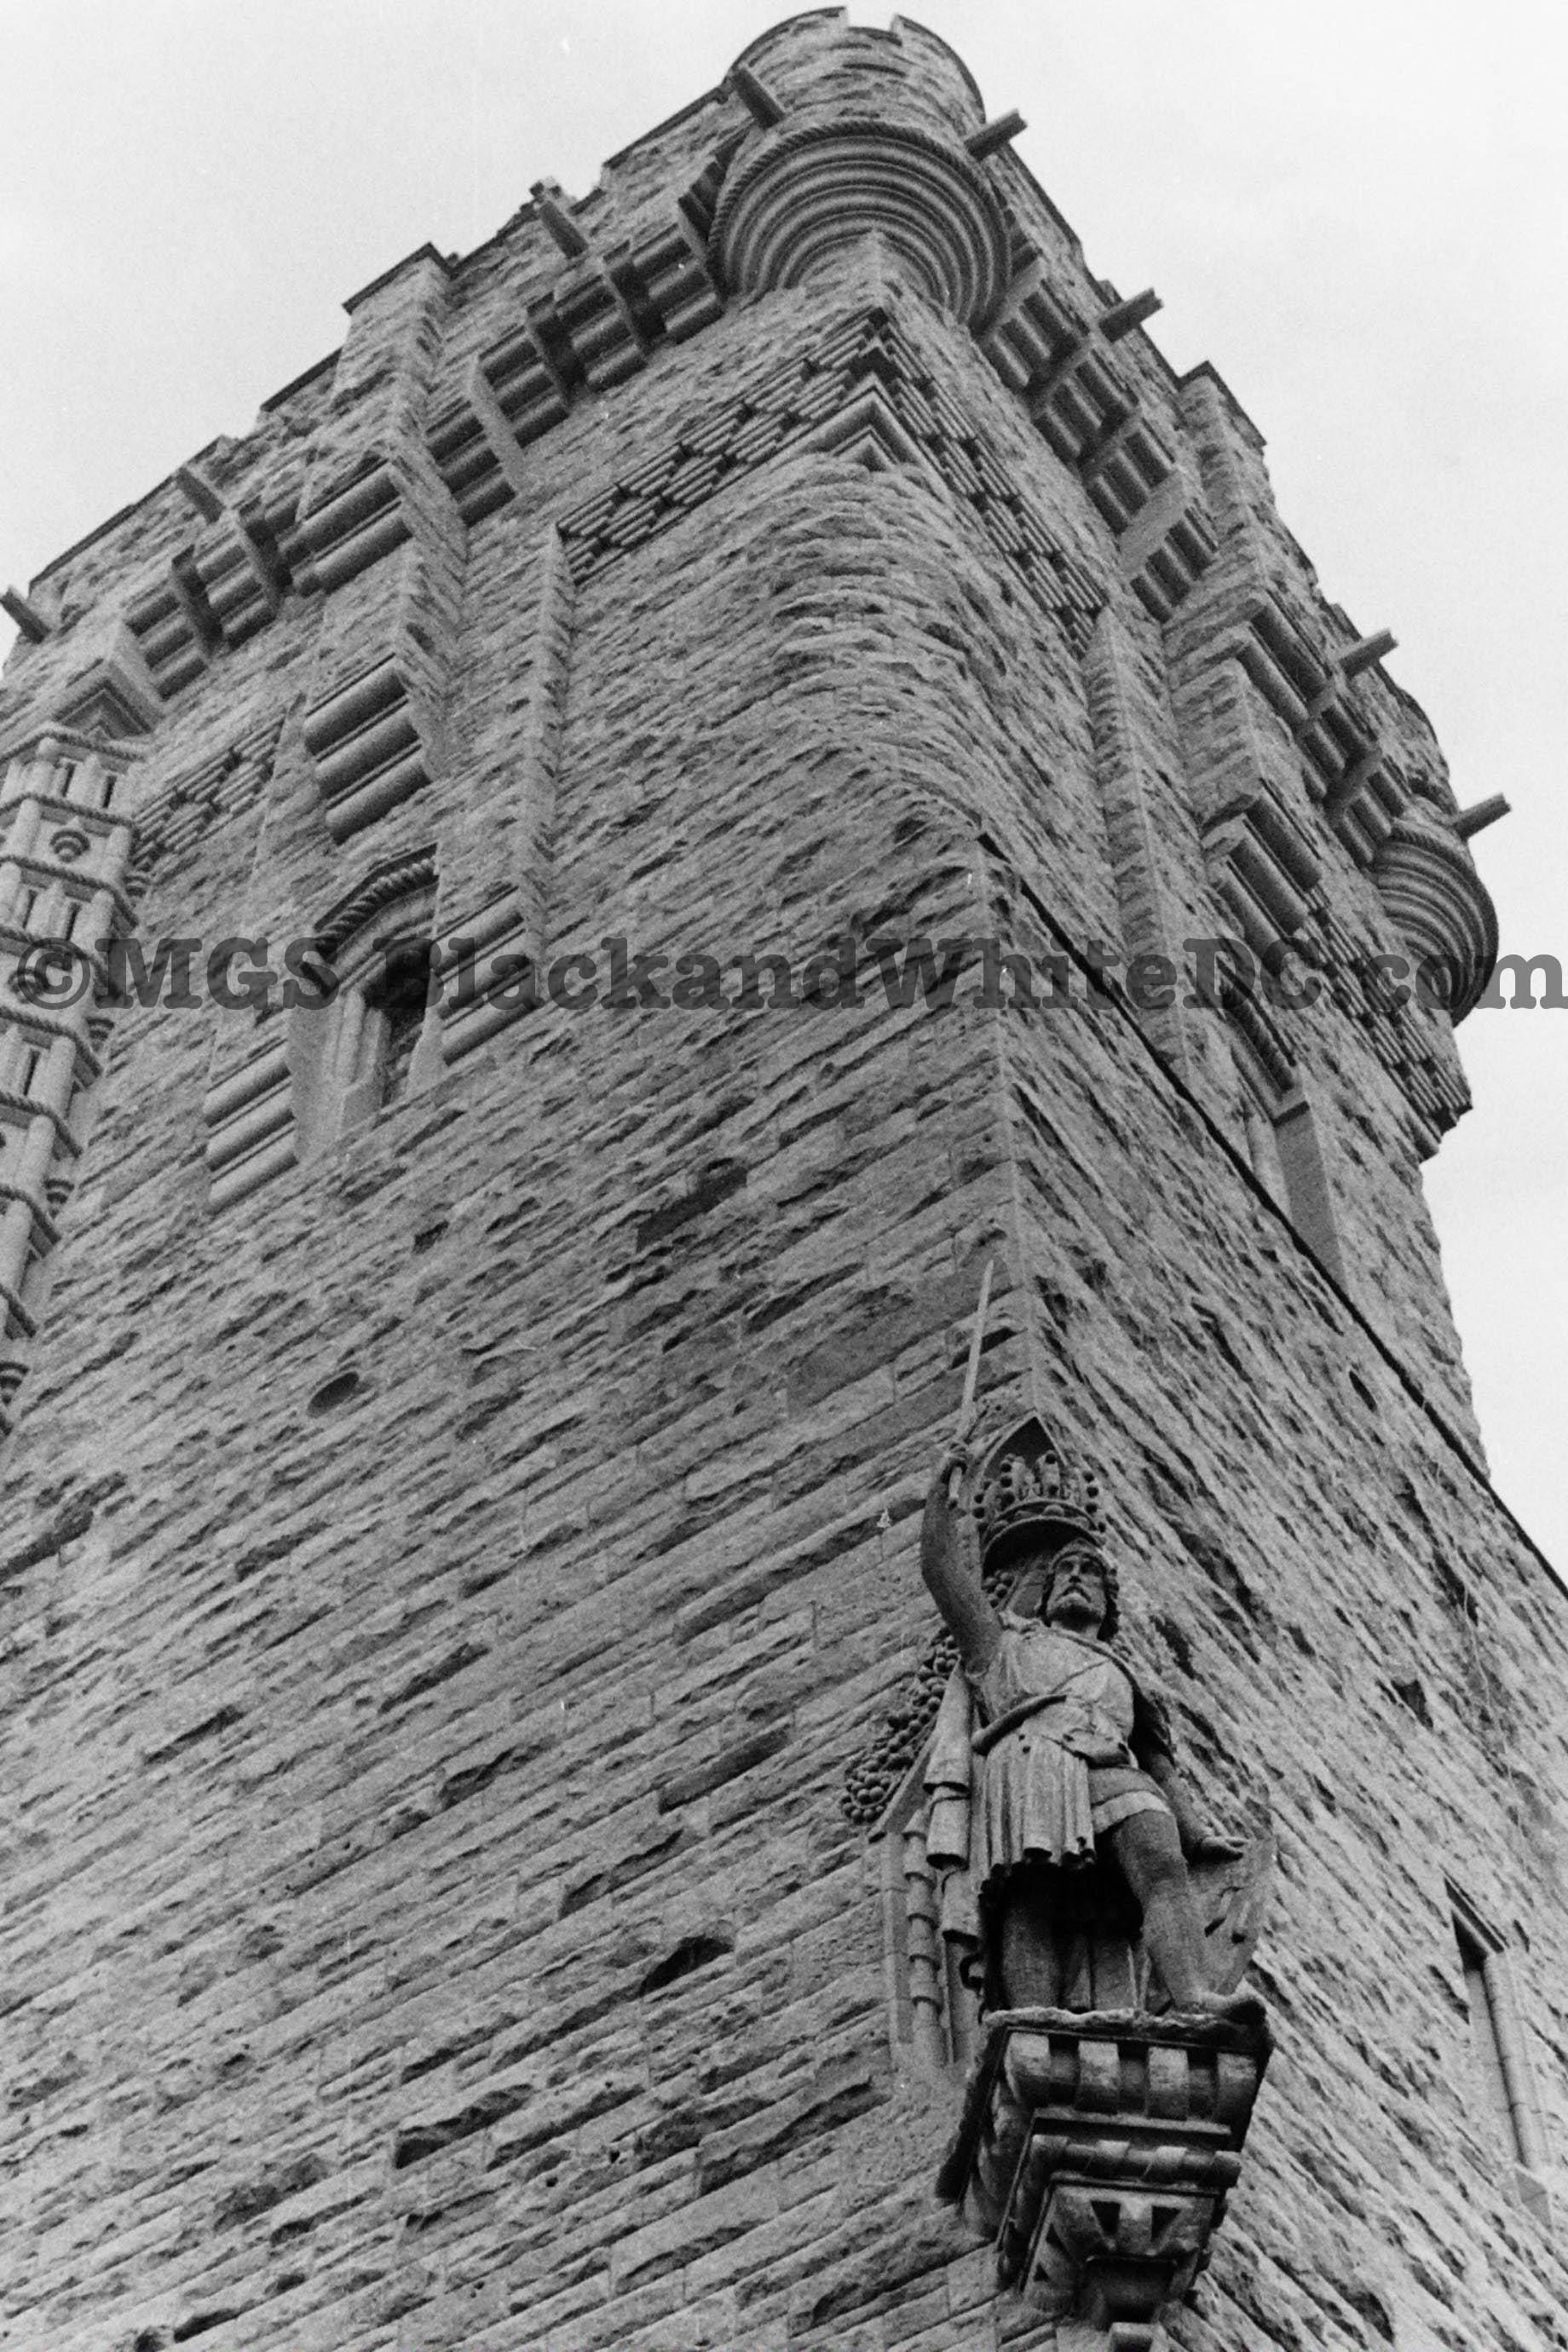 Scotlandcastle2006_7.jpg